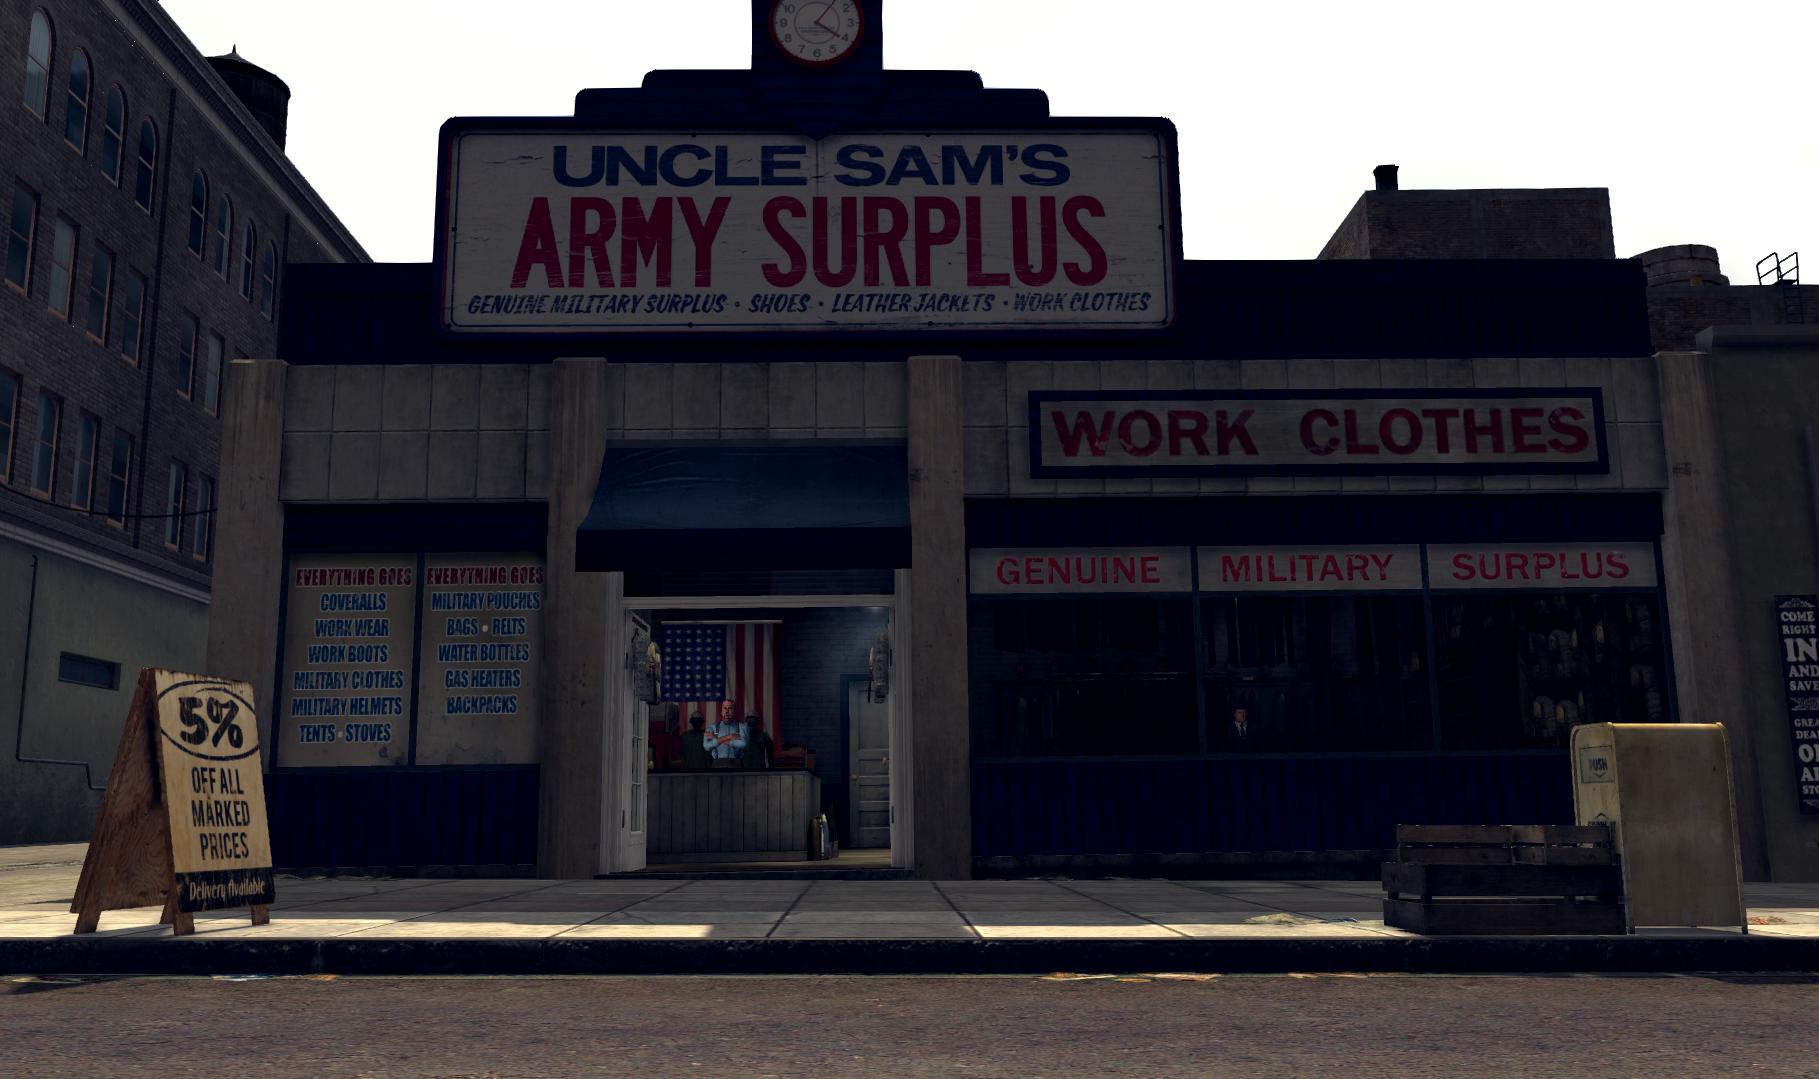 Uncle Sam's Army Surplus